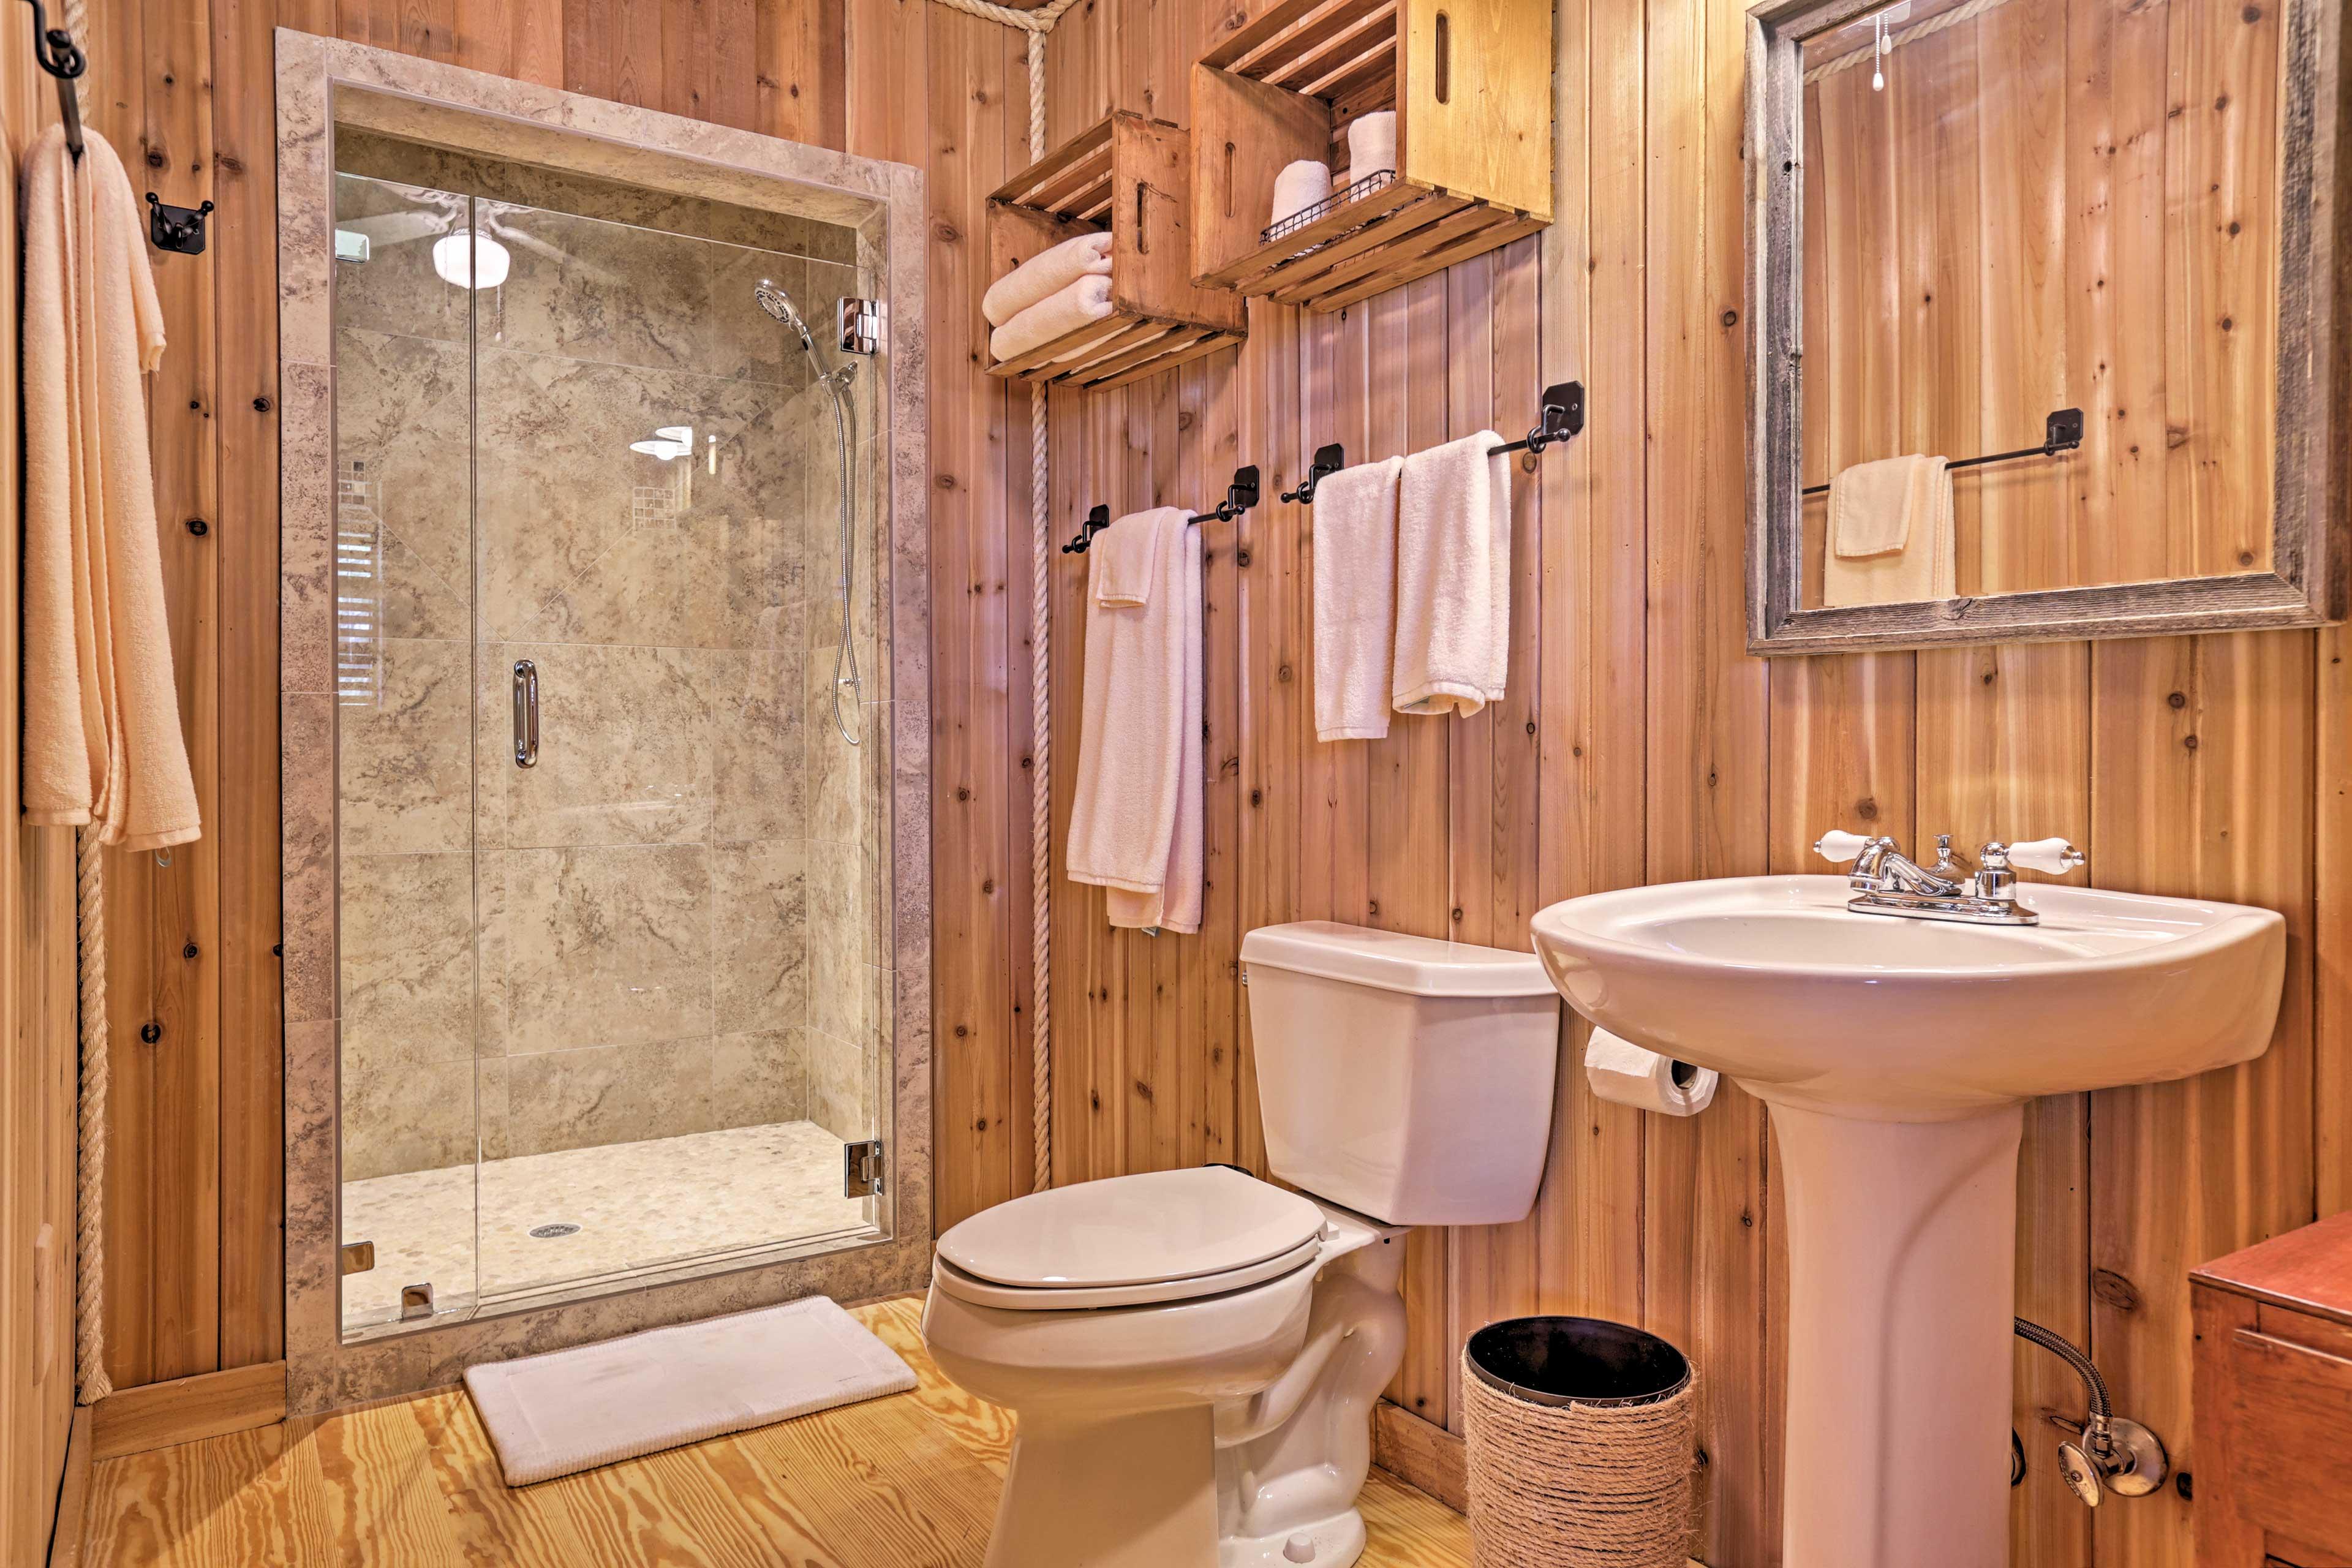 The home boasts 2 full bathrooms.